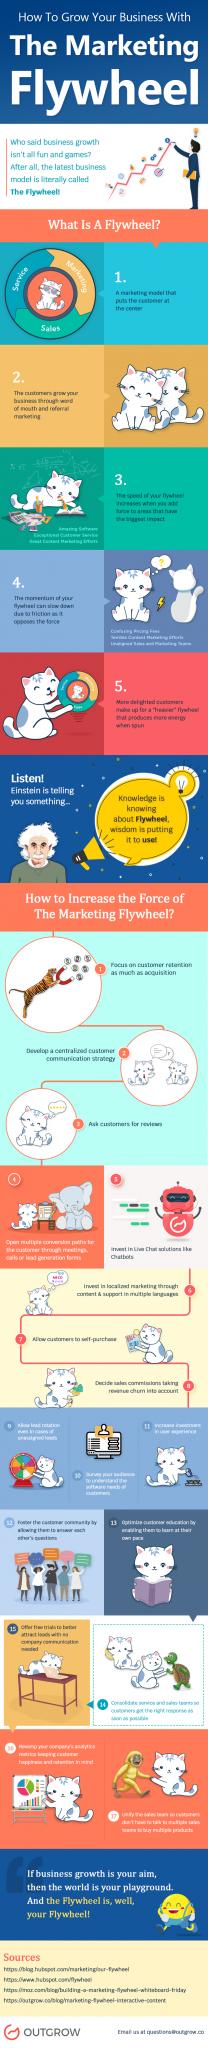 marketing flywheel infographic